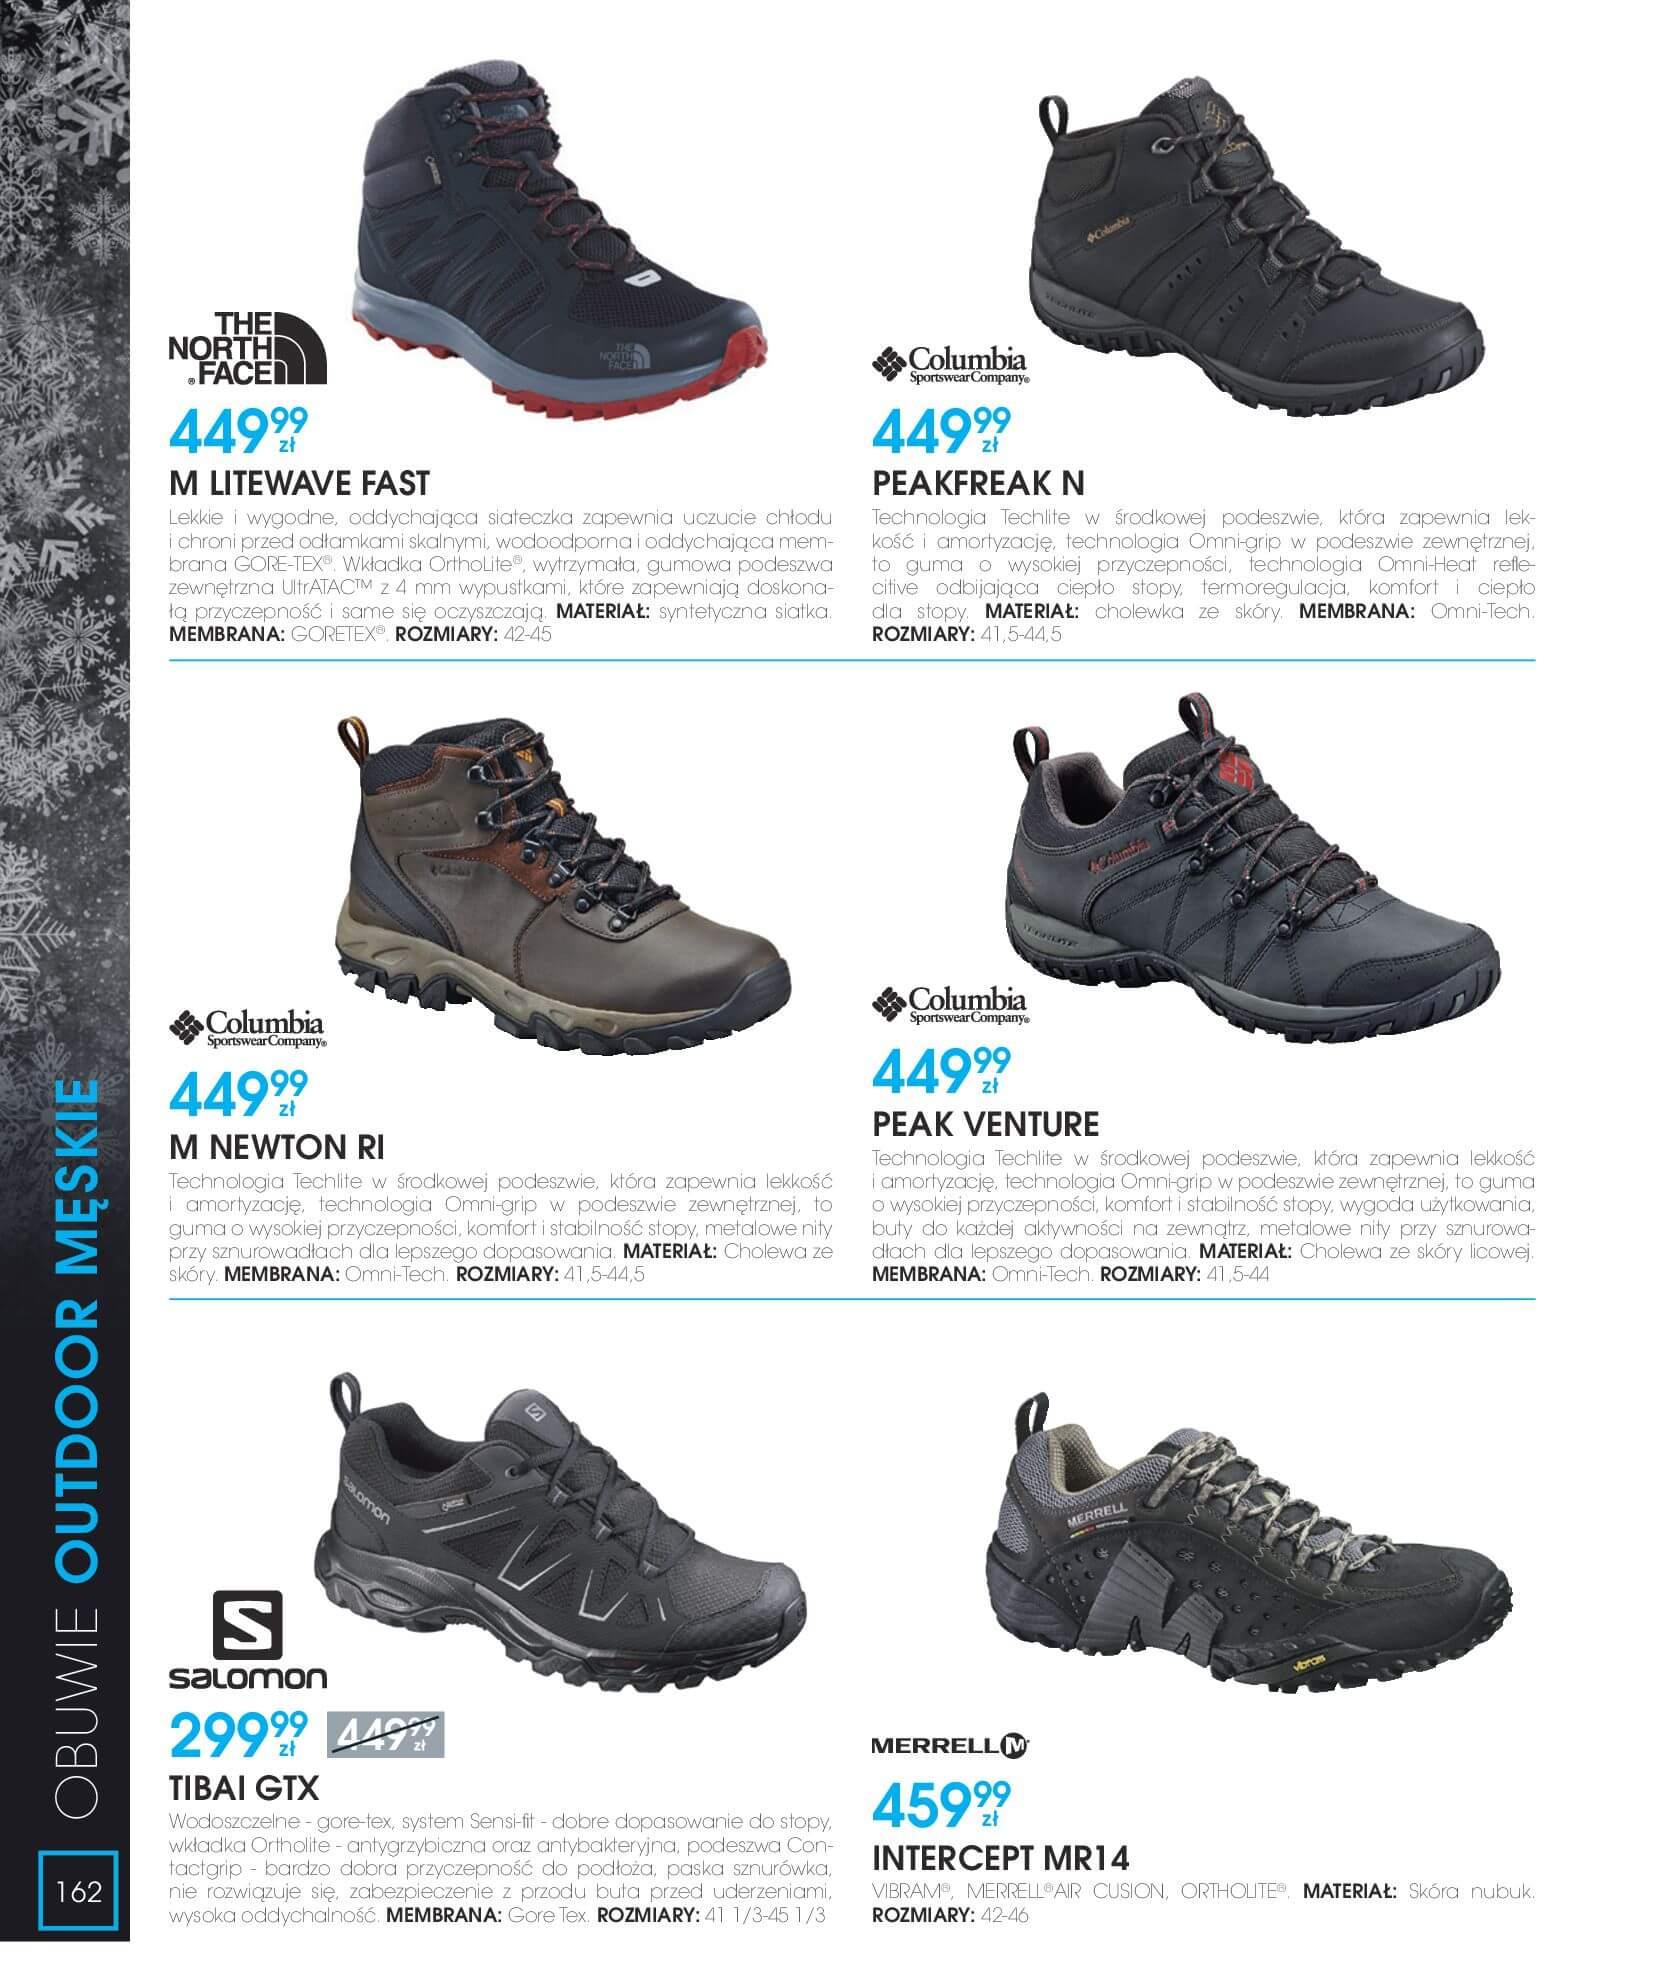 Gazetka Go Sport - Katalog Zima 2017/2018-12.11.2017-28.02.2018-page-162